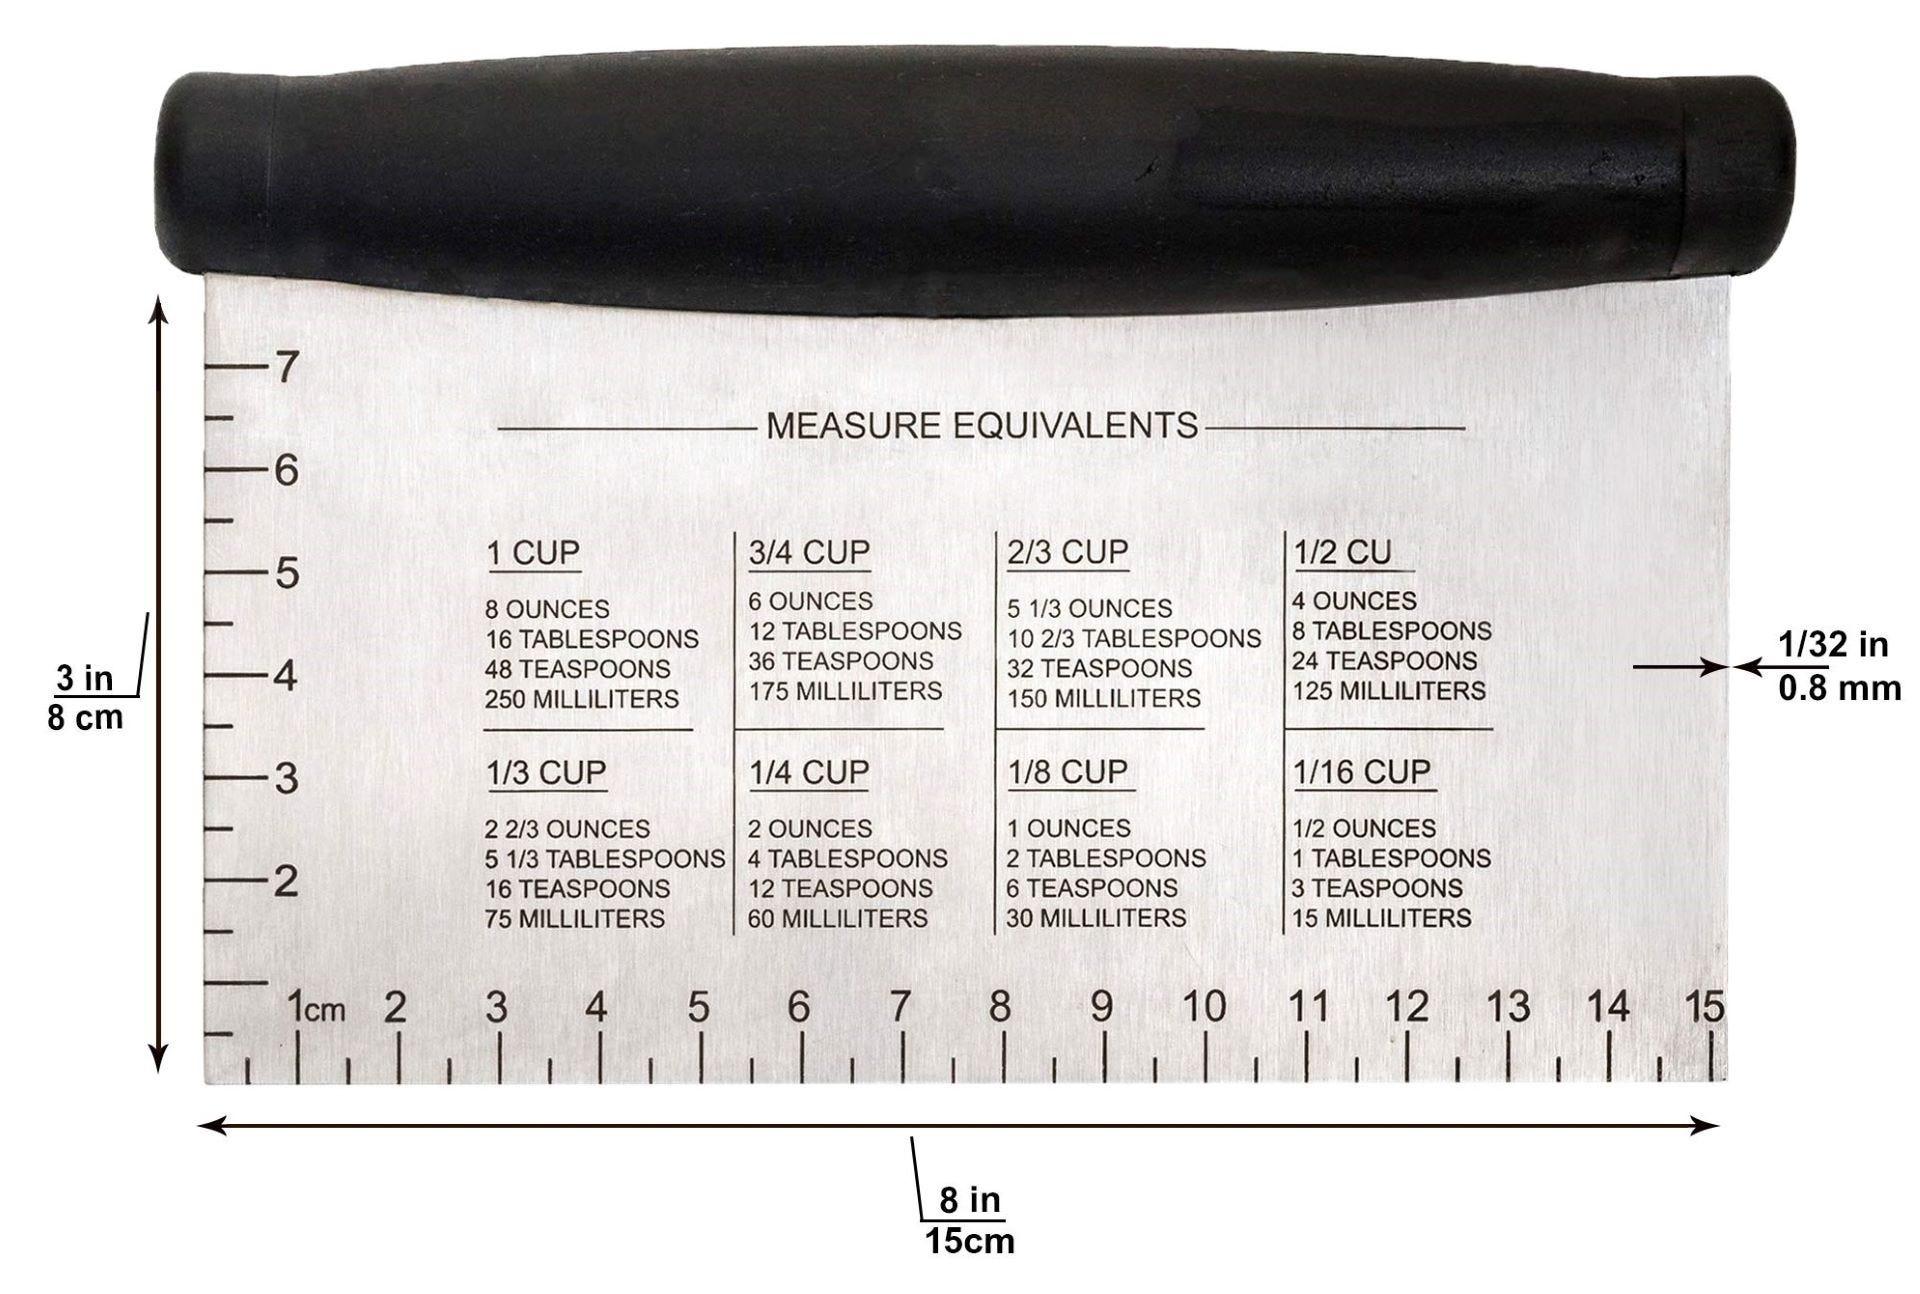 Metal scraper with measurements on it.